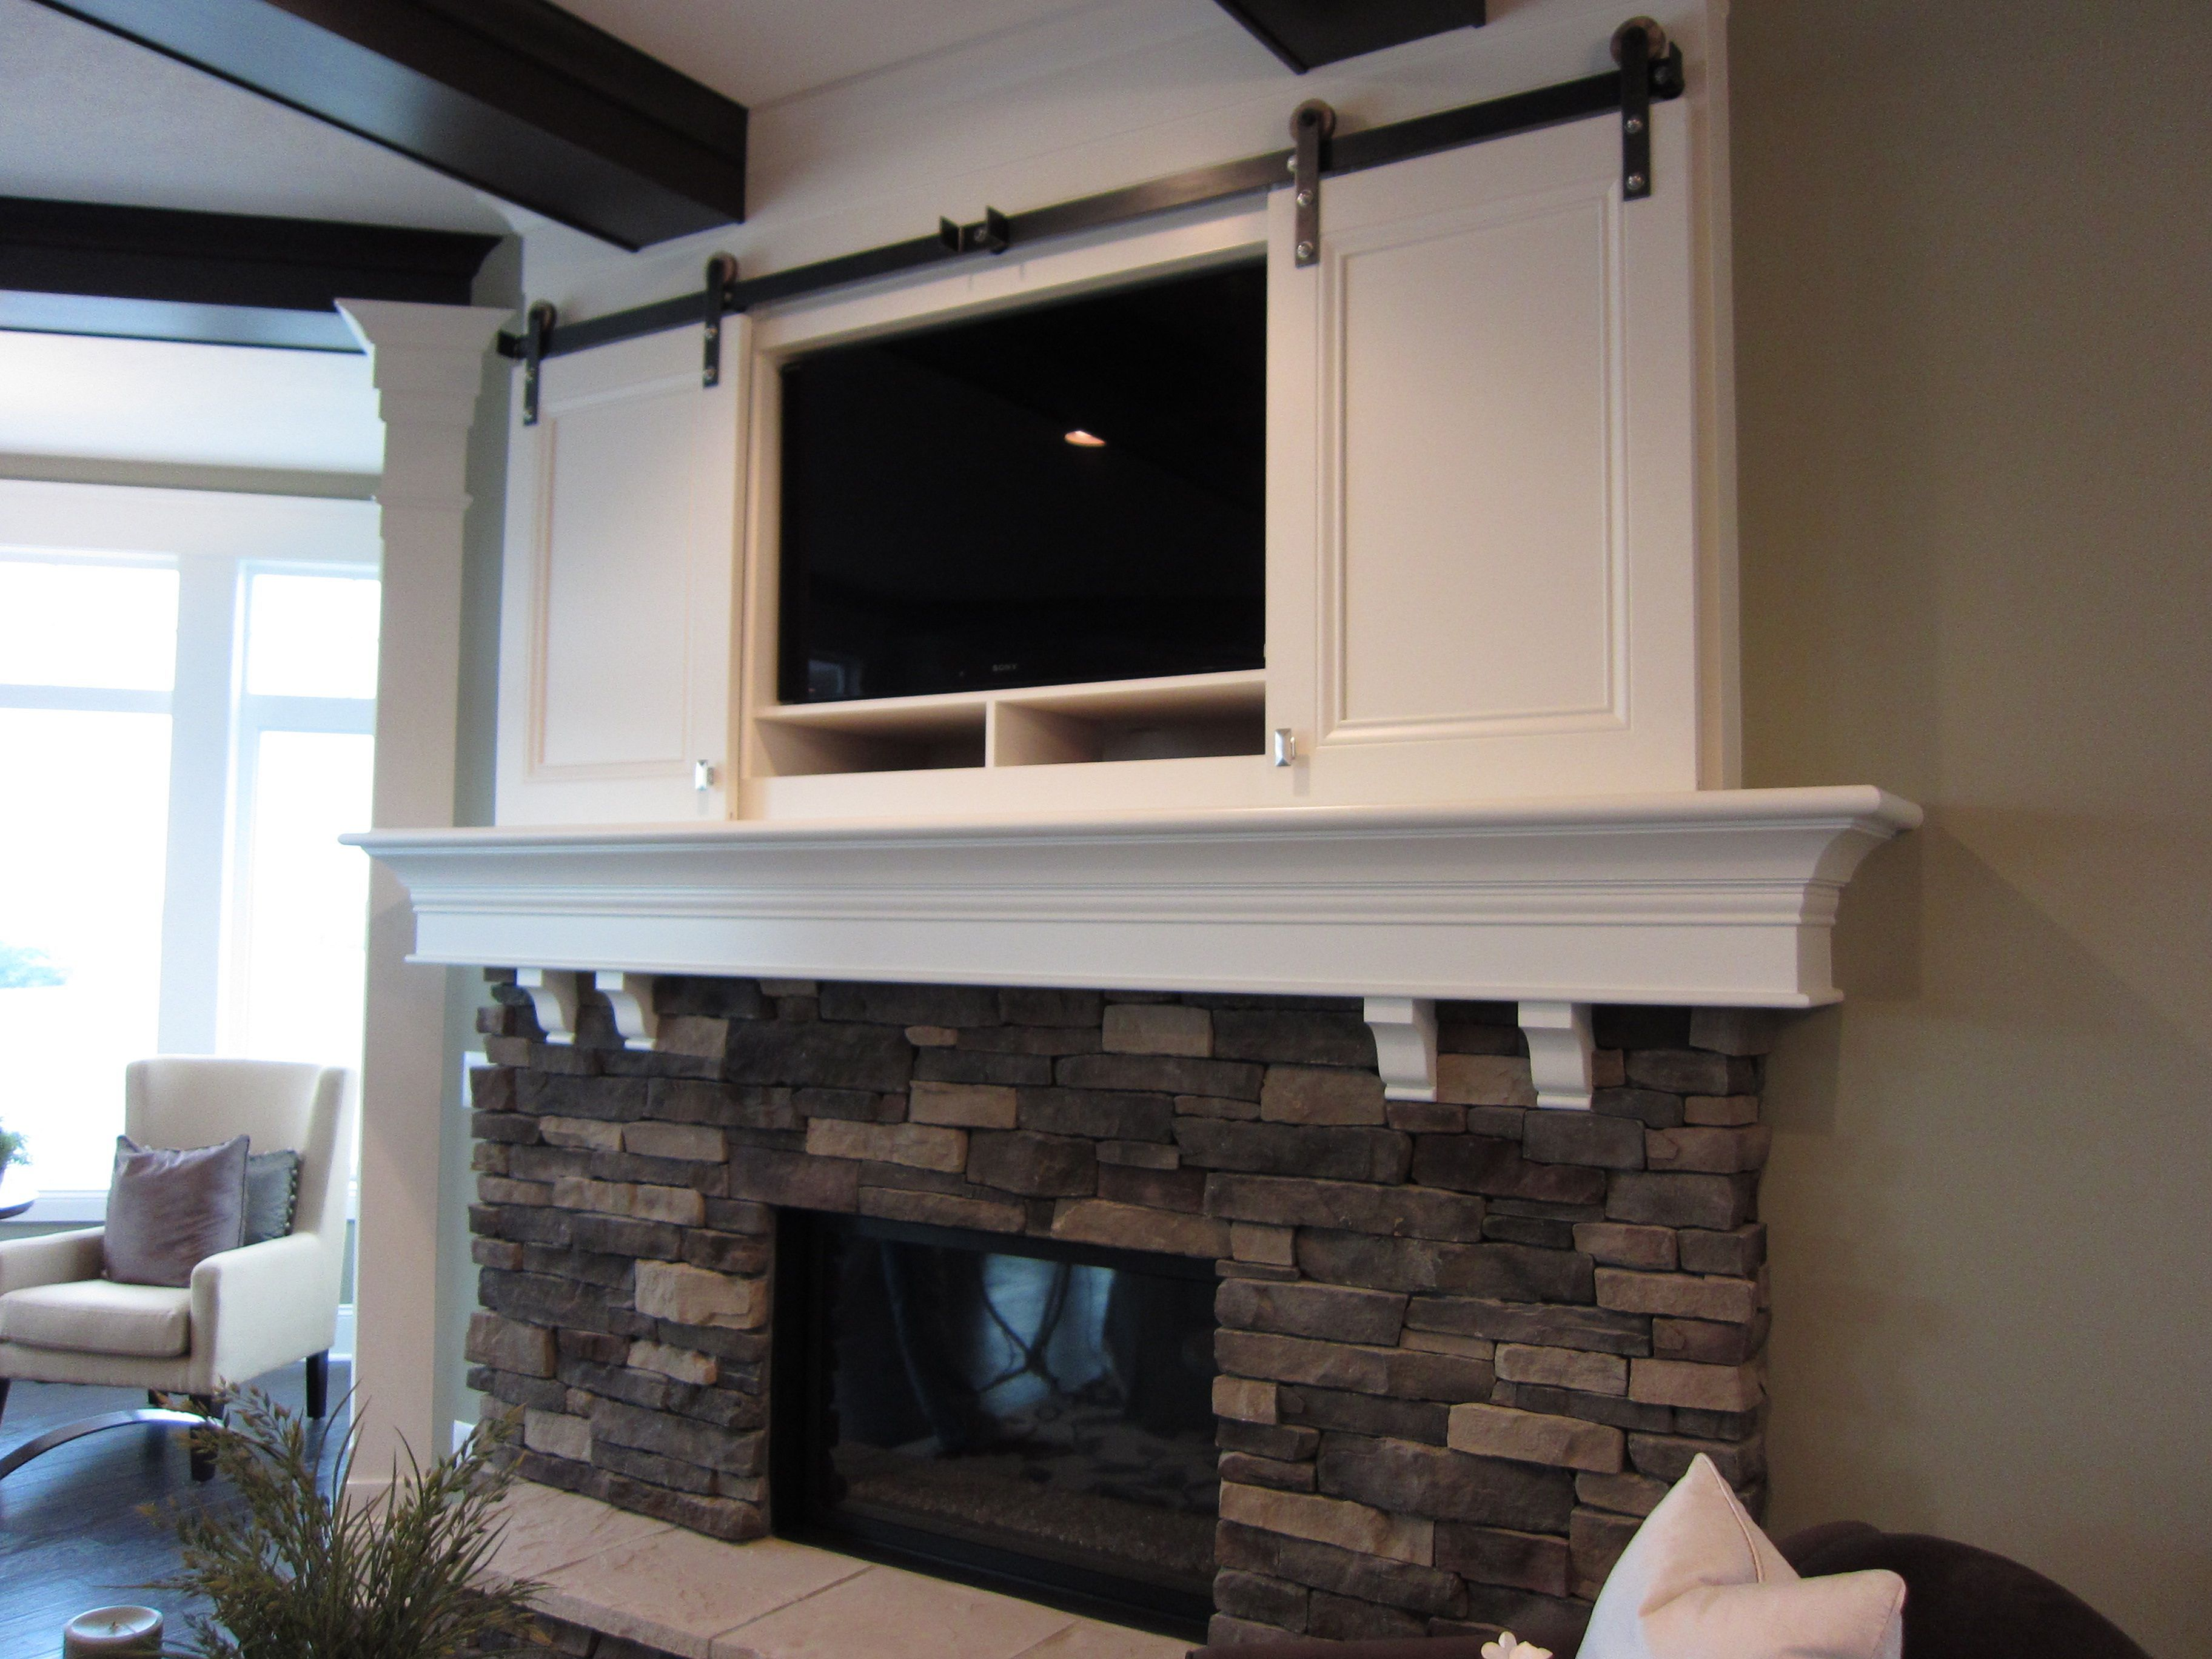 Inspiring 50 Beautiful Living Room Fireplace With Wood Ideas Https Freshouz Com 50 Stone Fireplace Designs Stone Fireplace Surround Stone Fireplace Pictures